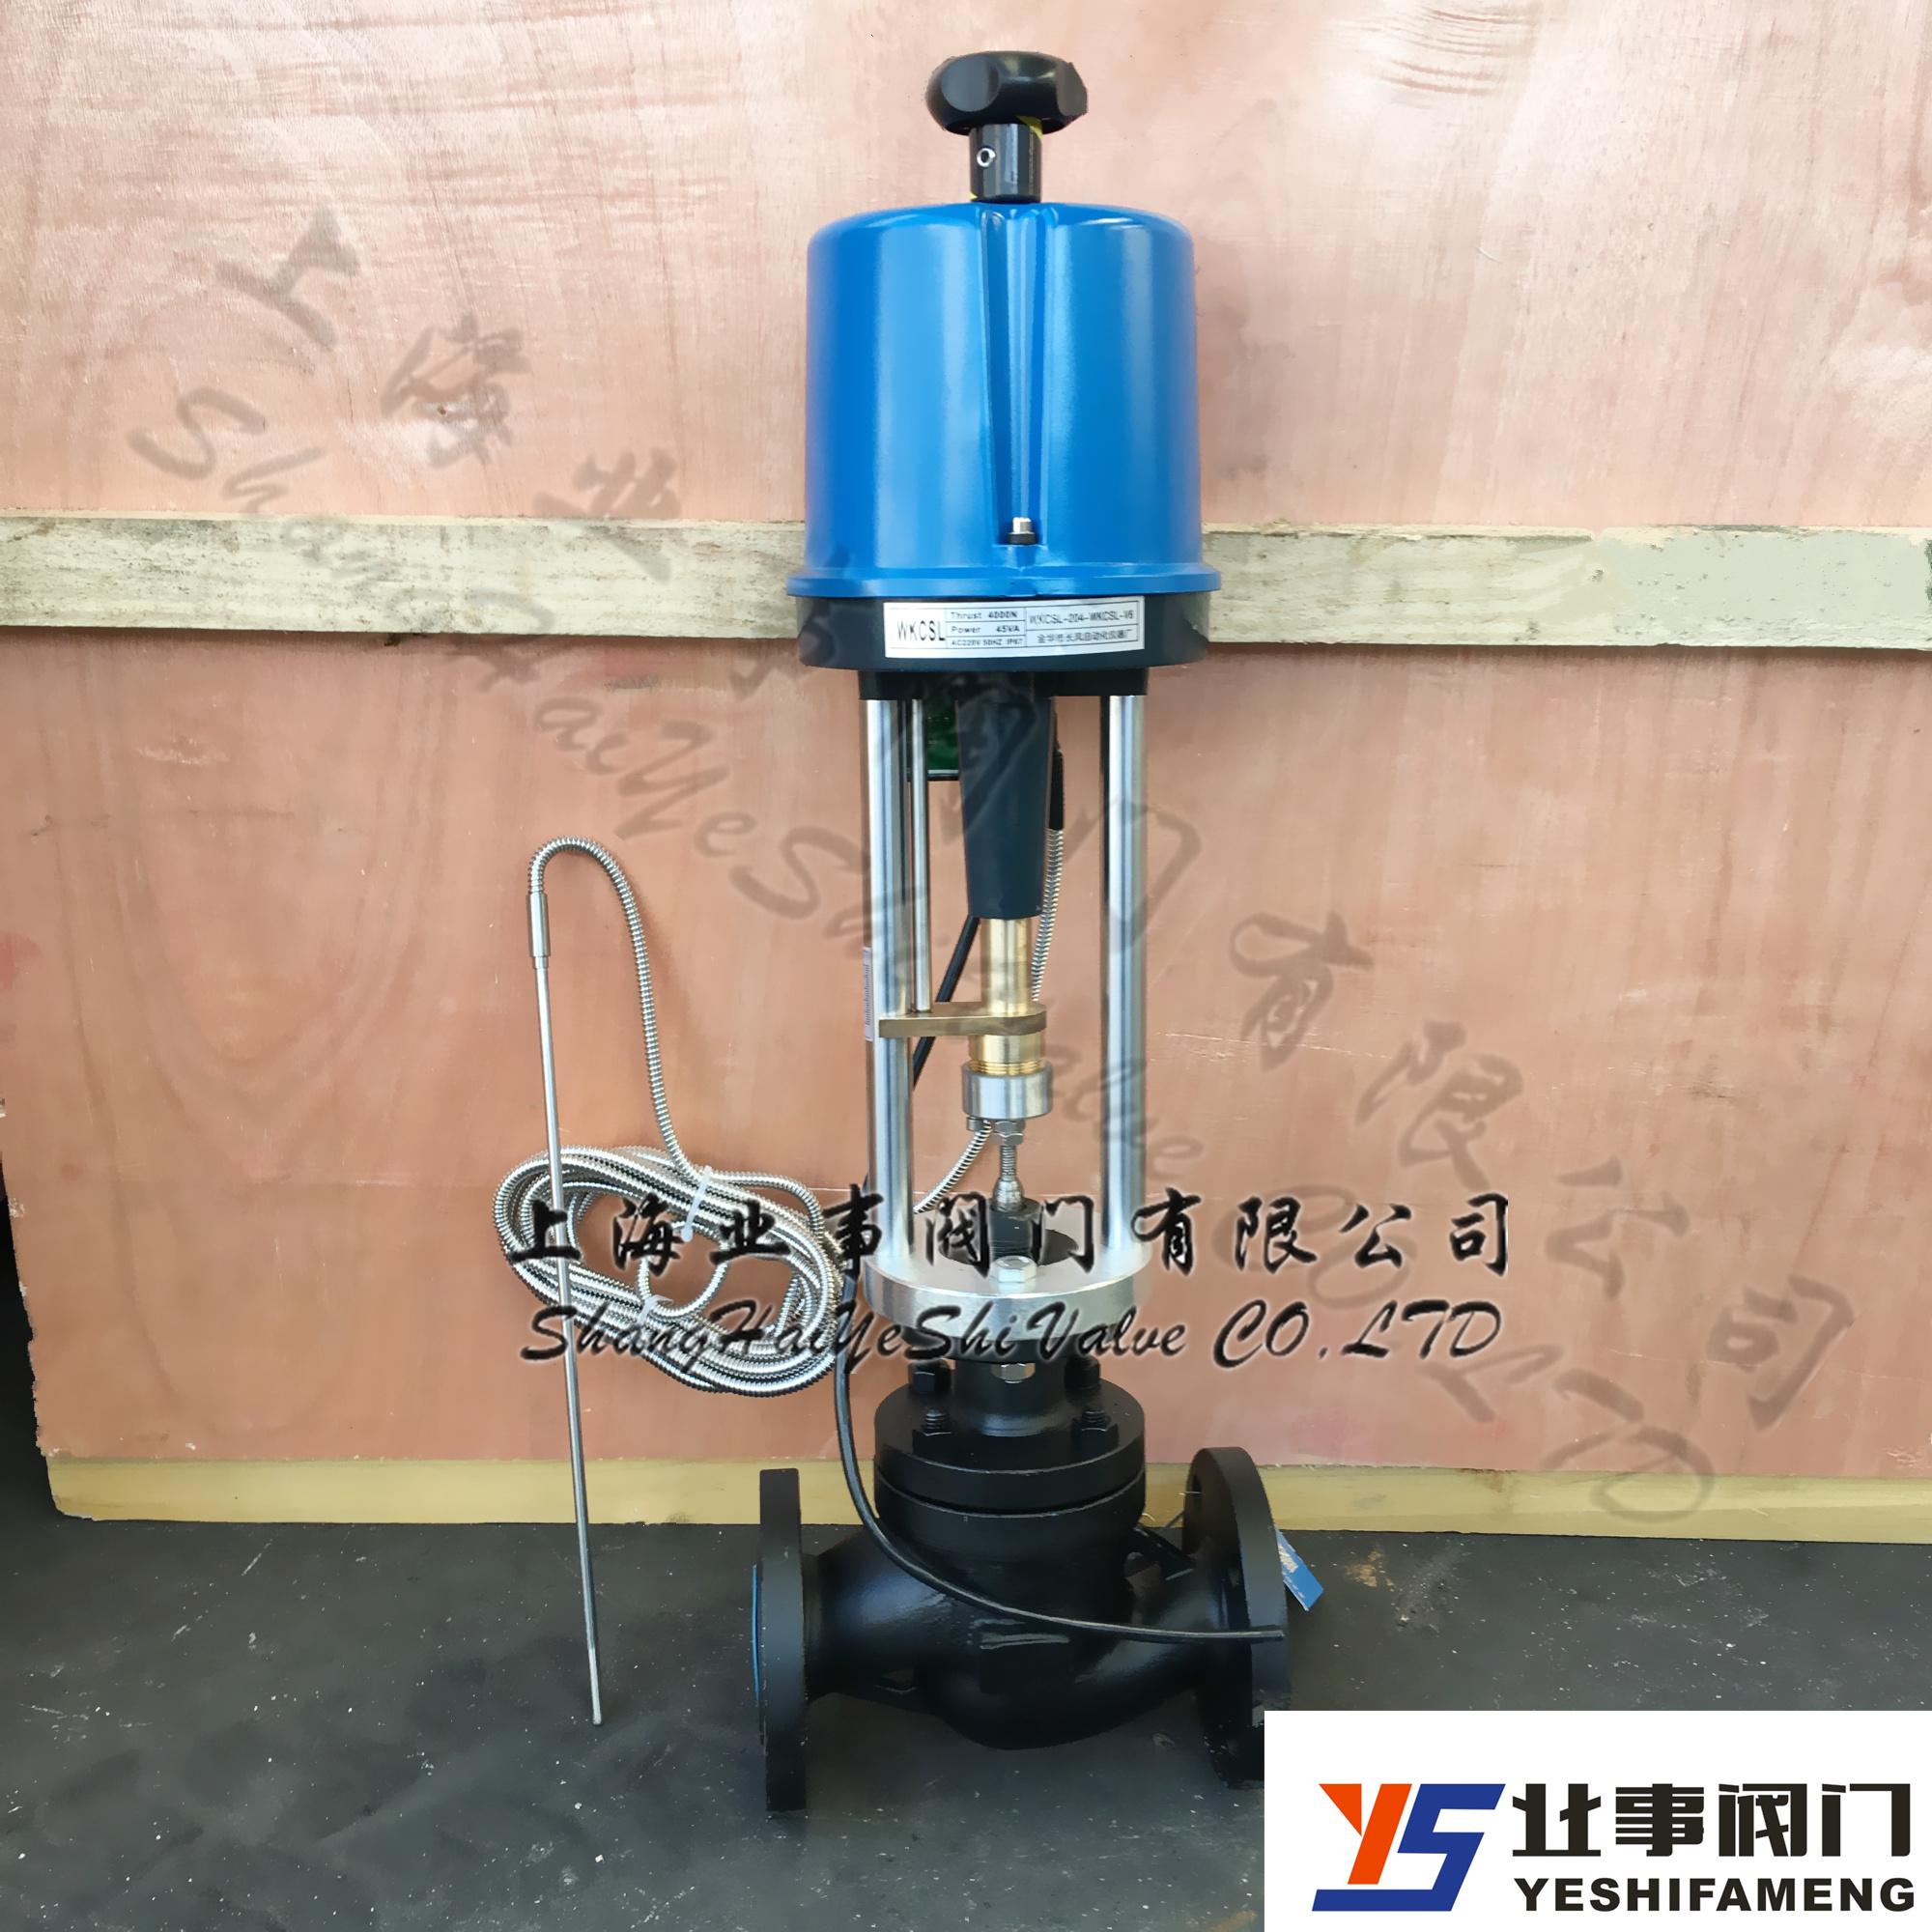 ZZWPE-16C高温の蒸気熱伝導油電気温度調節弁電動サーモ調節弁DN20-400